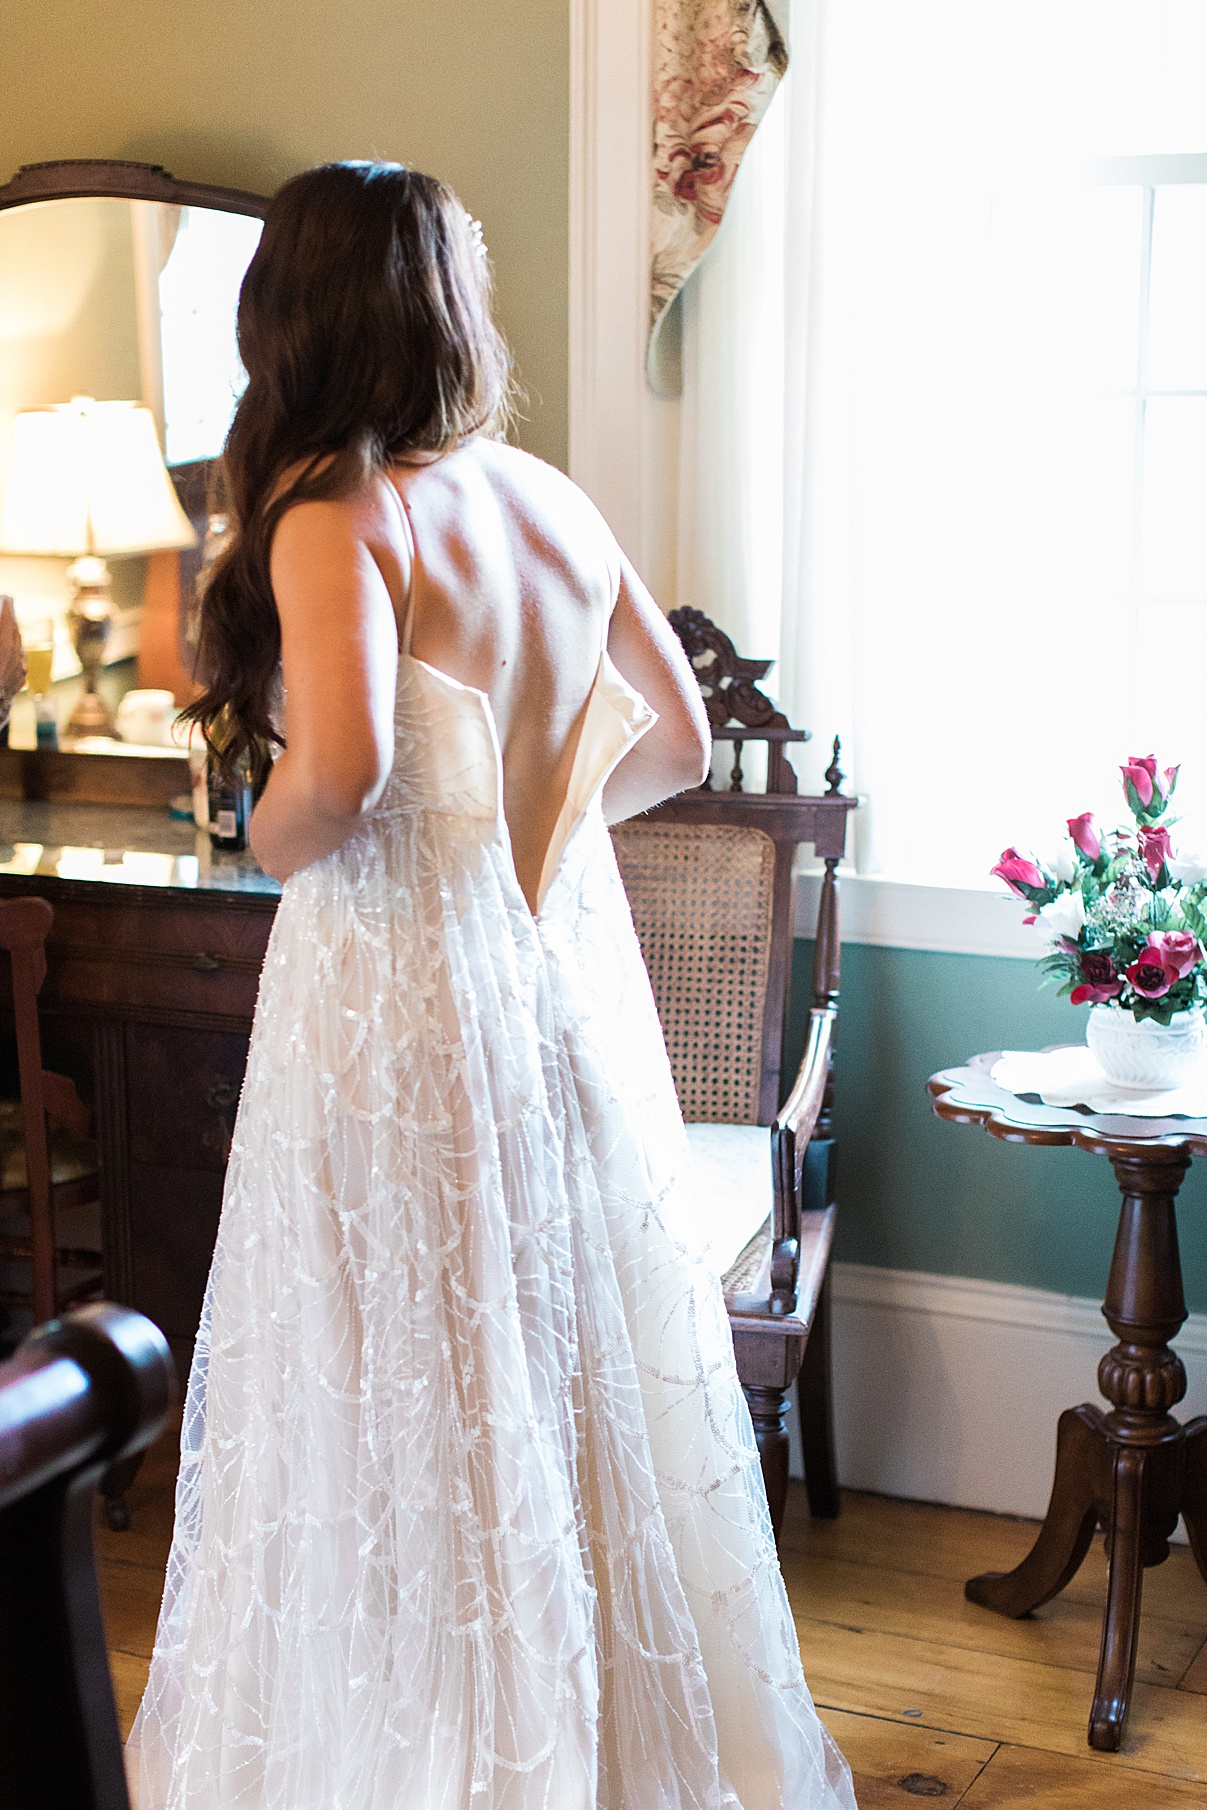 Bride getting into wedding dress| Balls Falls, Ontario Wedding| Ontario Wedding Photographer| Toronto Wedding Photographer| 3Photography|3photography.ca